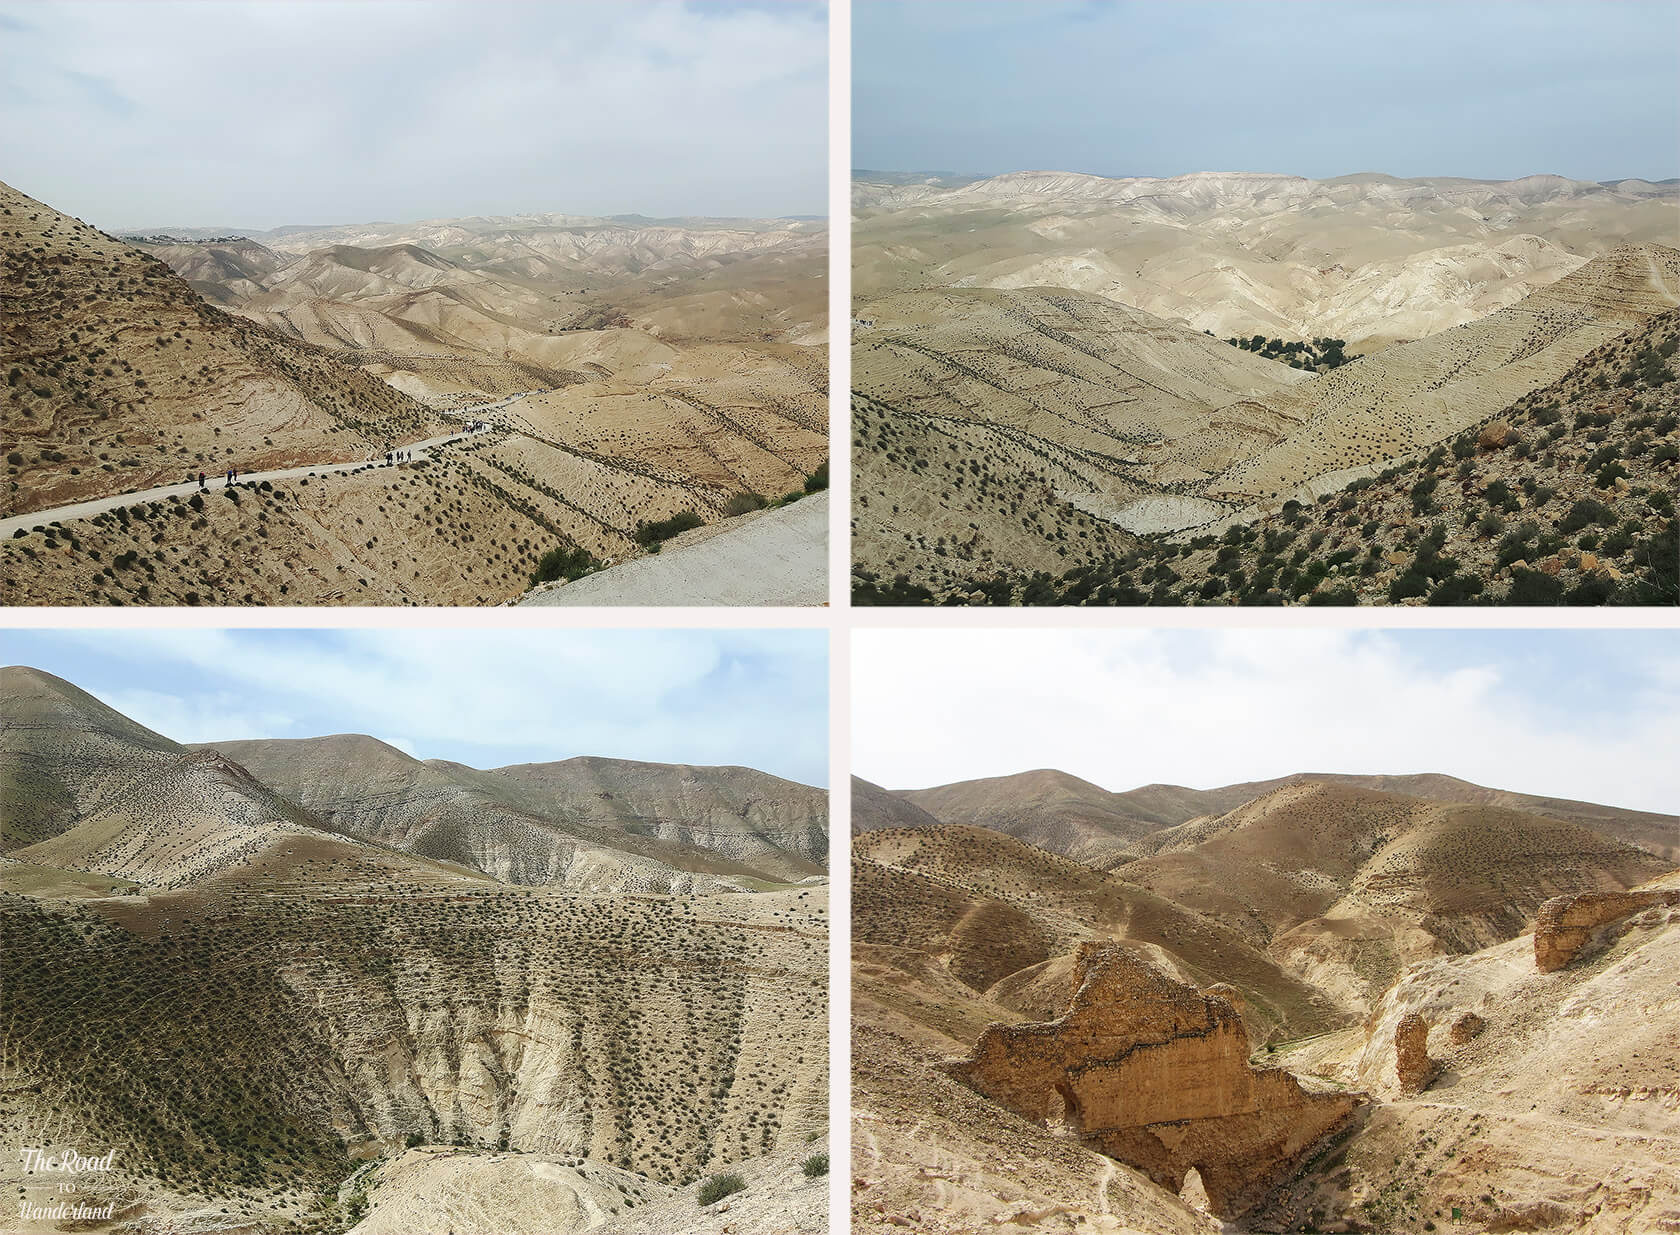 Images of the desert at Wadi Qelt